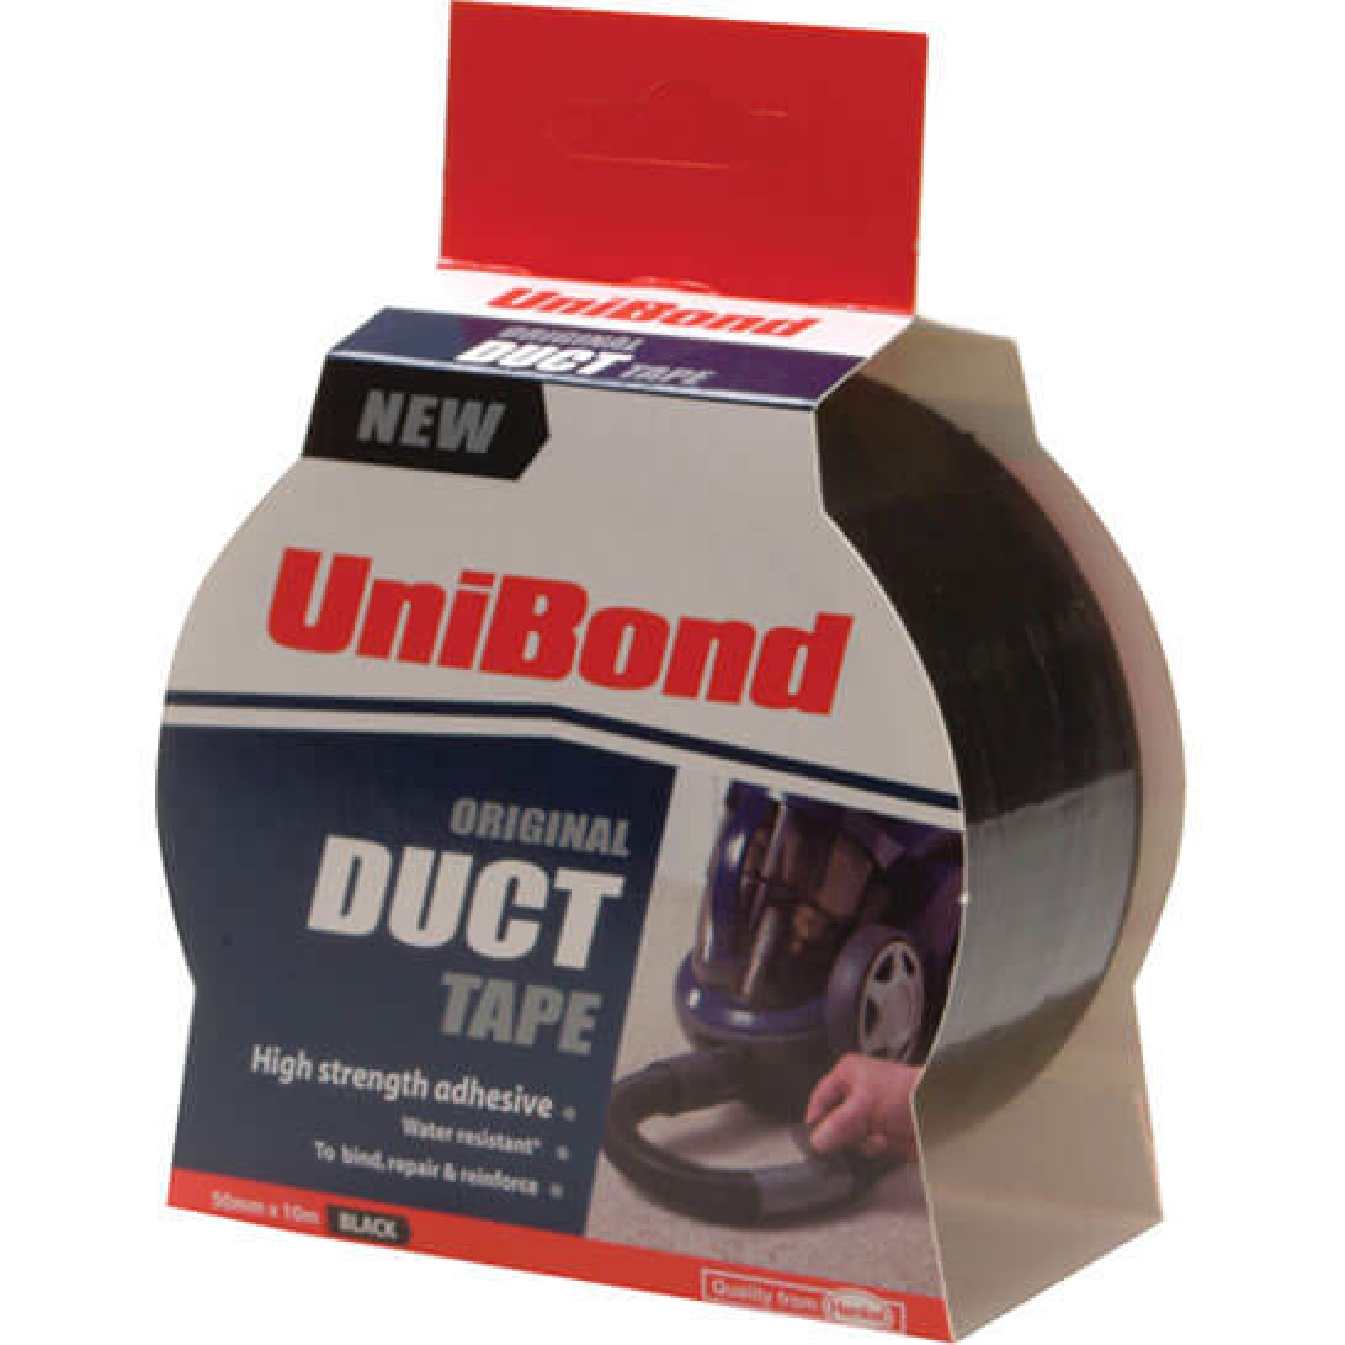 Image of Unibond Duct Tape Black 50mm 25m